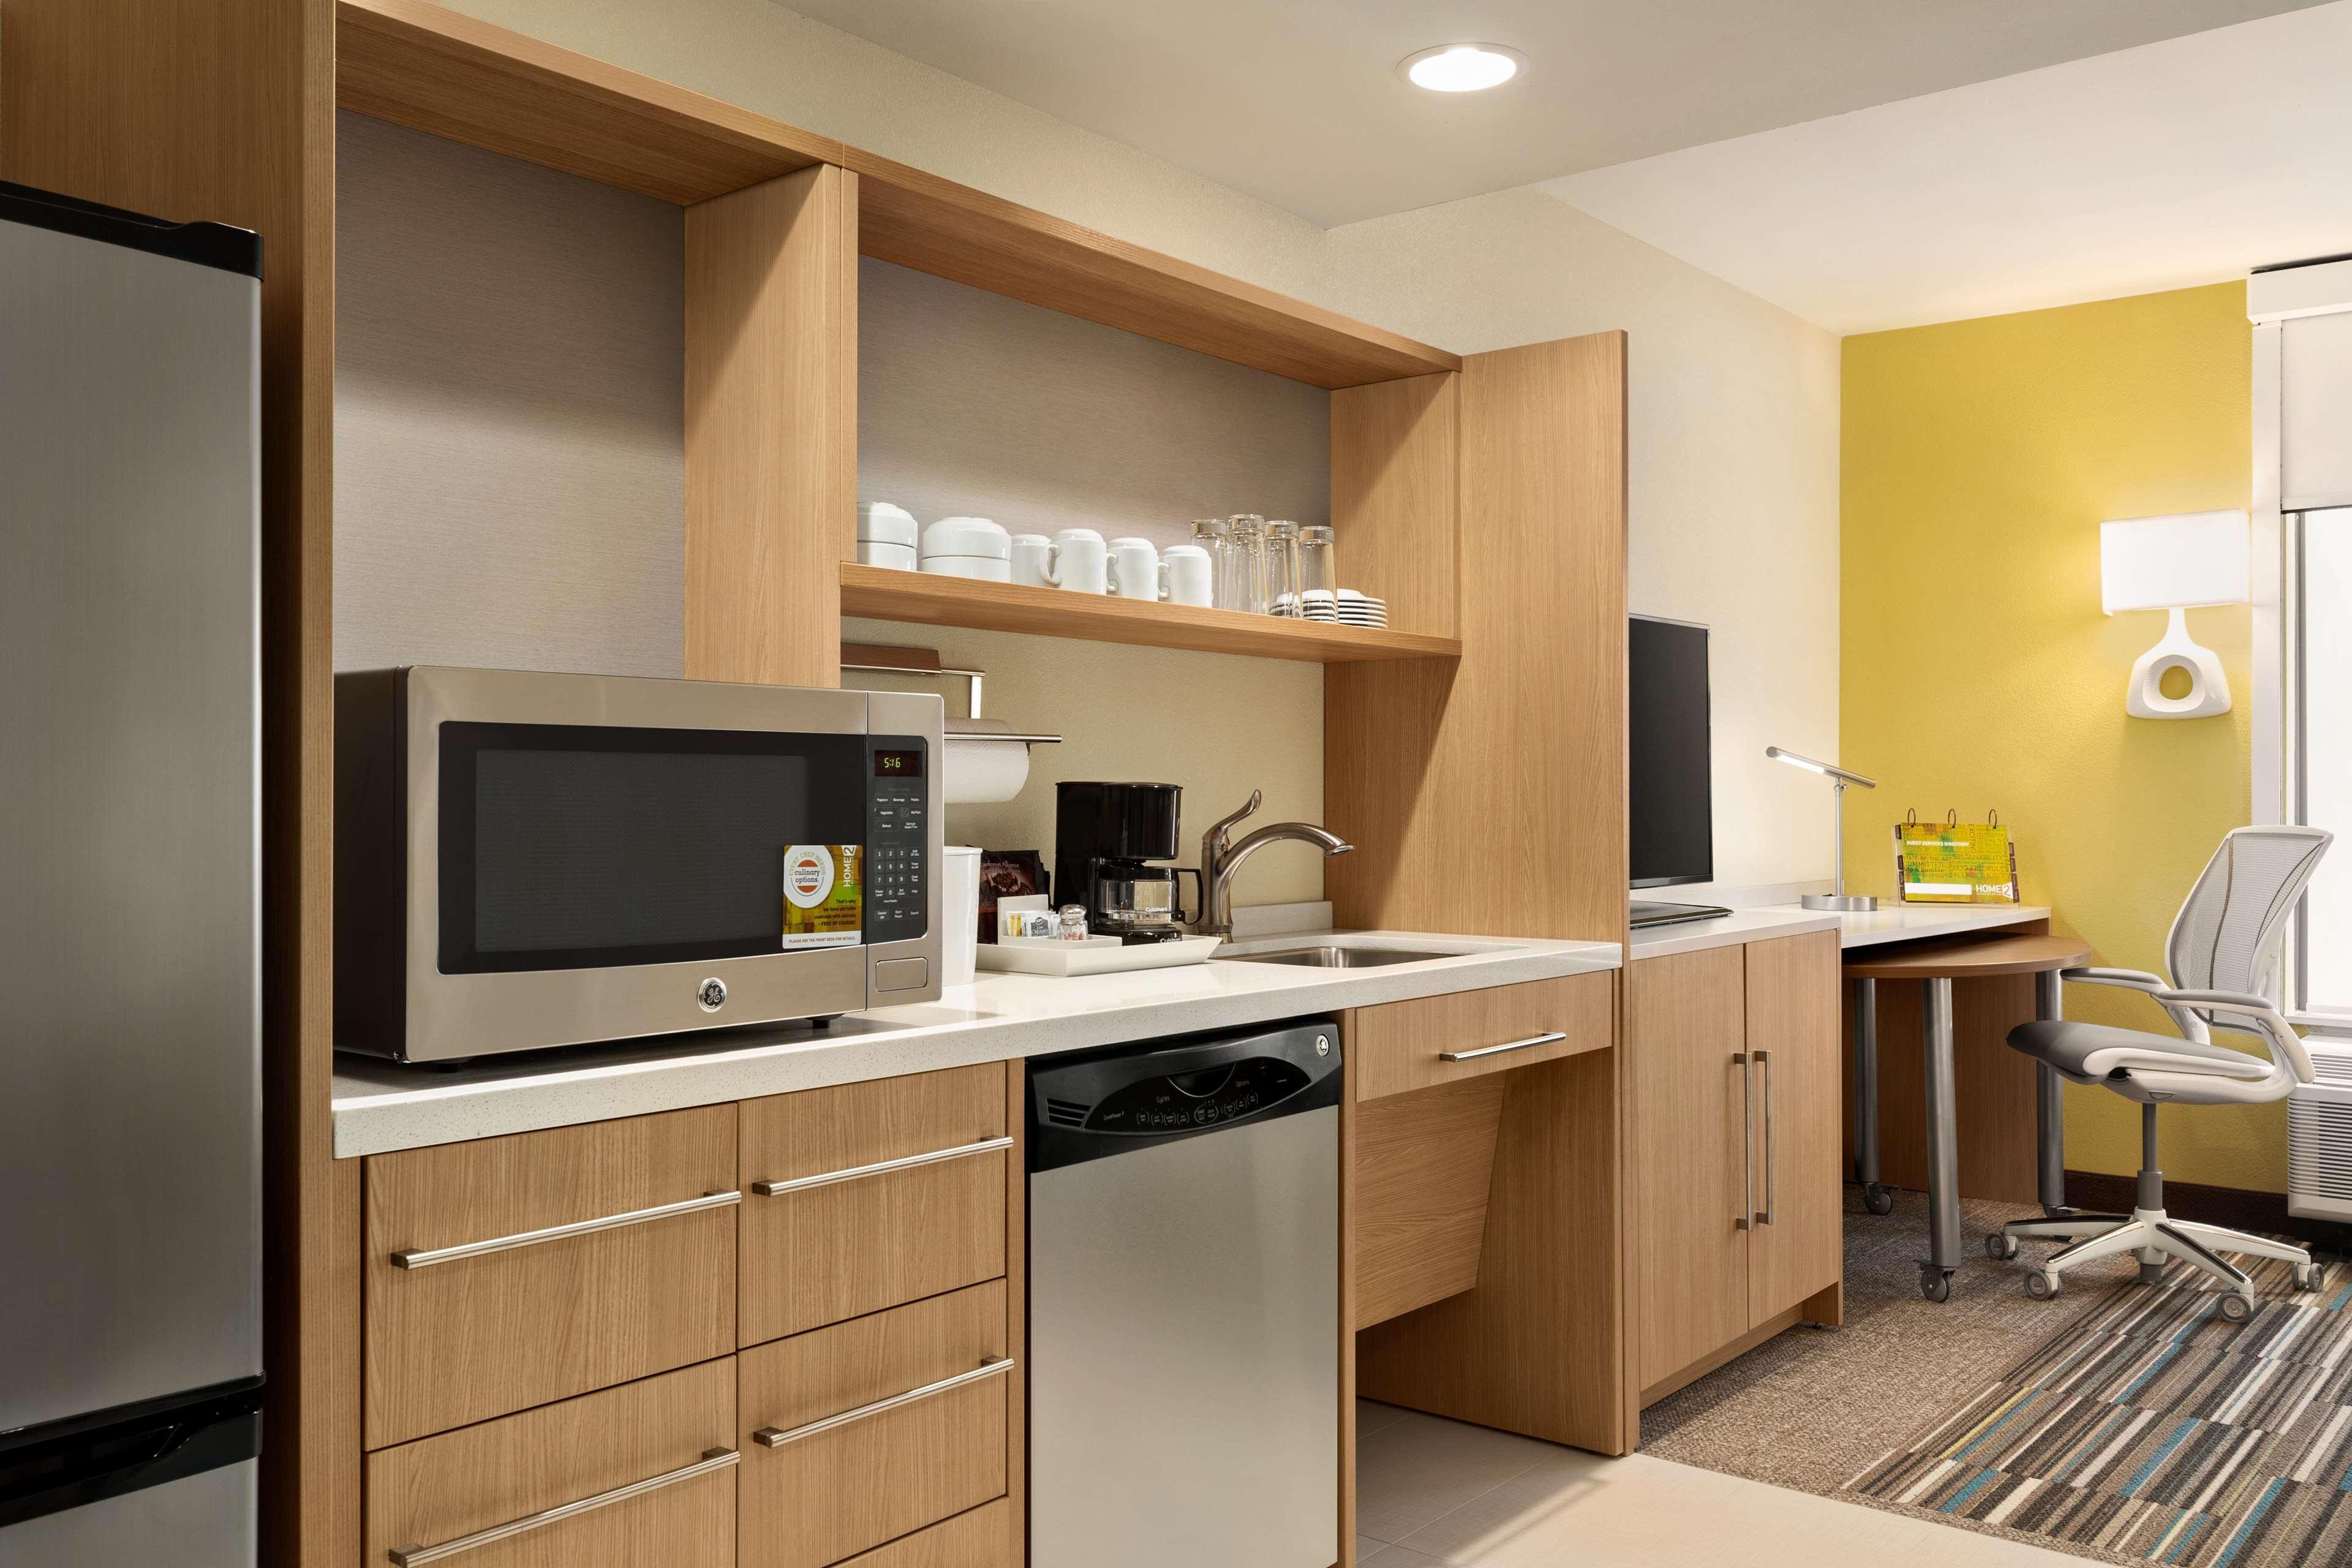 Home2 Suites by Hilton Waco image 7